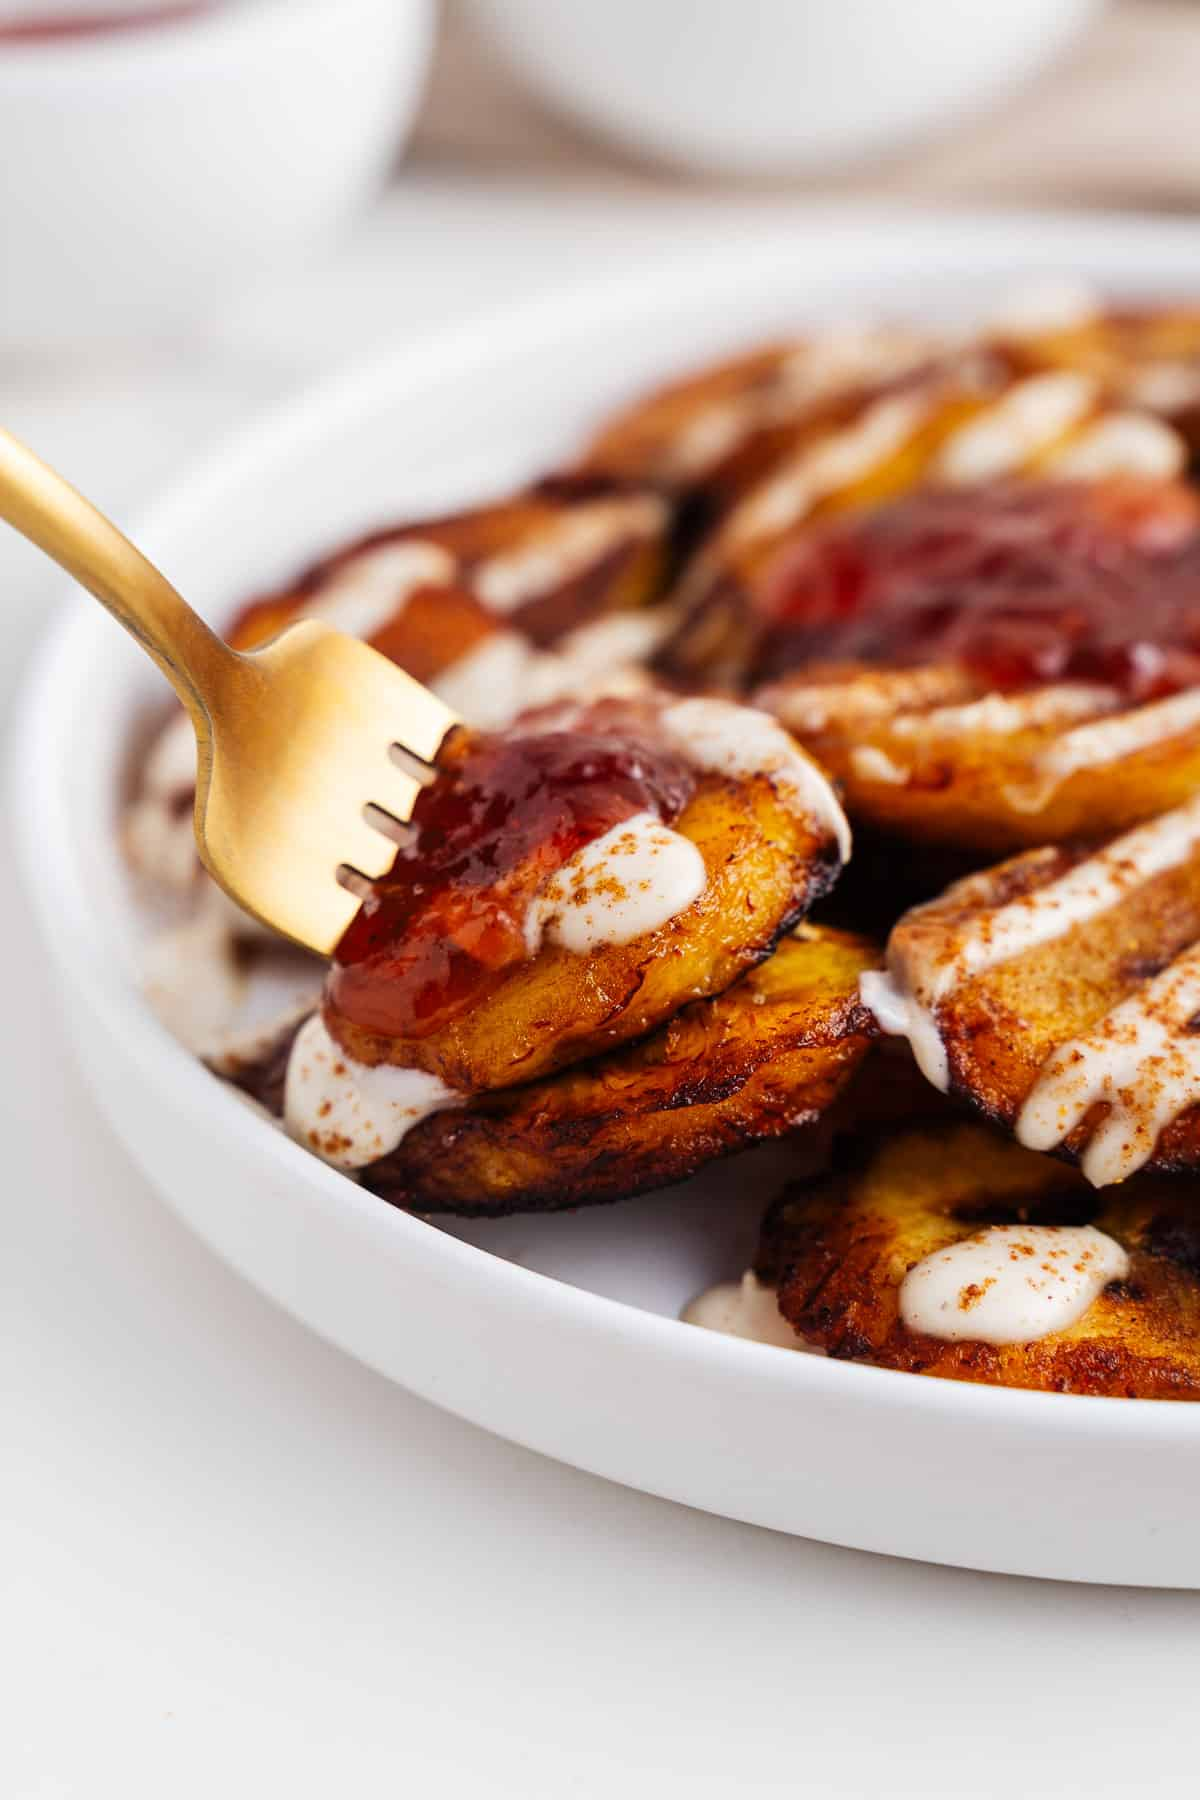 Forkful of Sweet Platanos Fritos